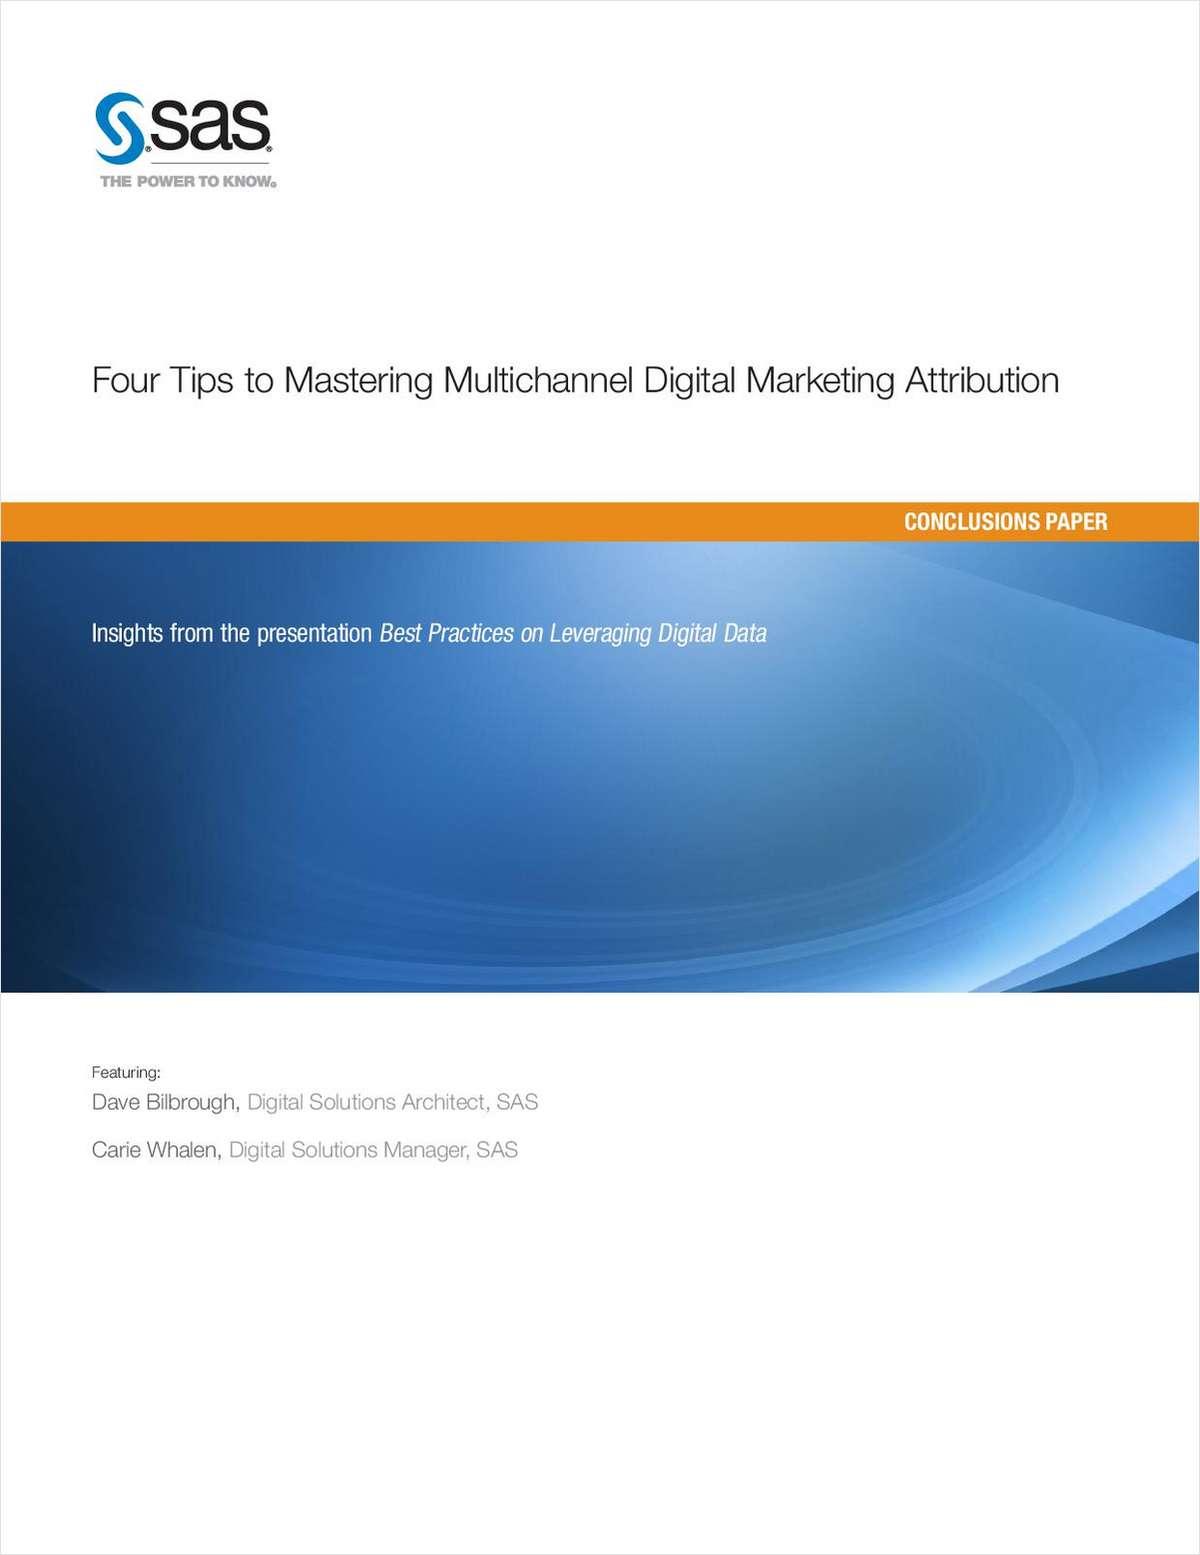 Four Tips to Mastering Multichannel Digital Marketing Attribution